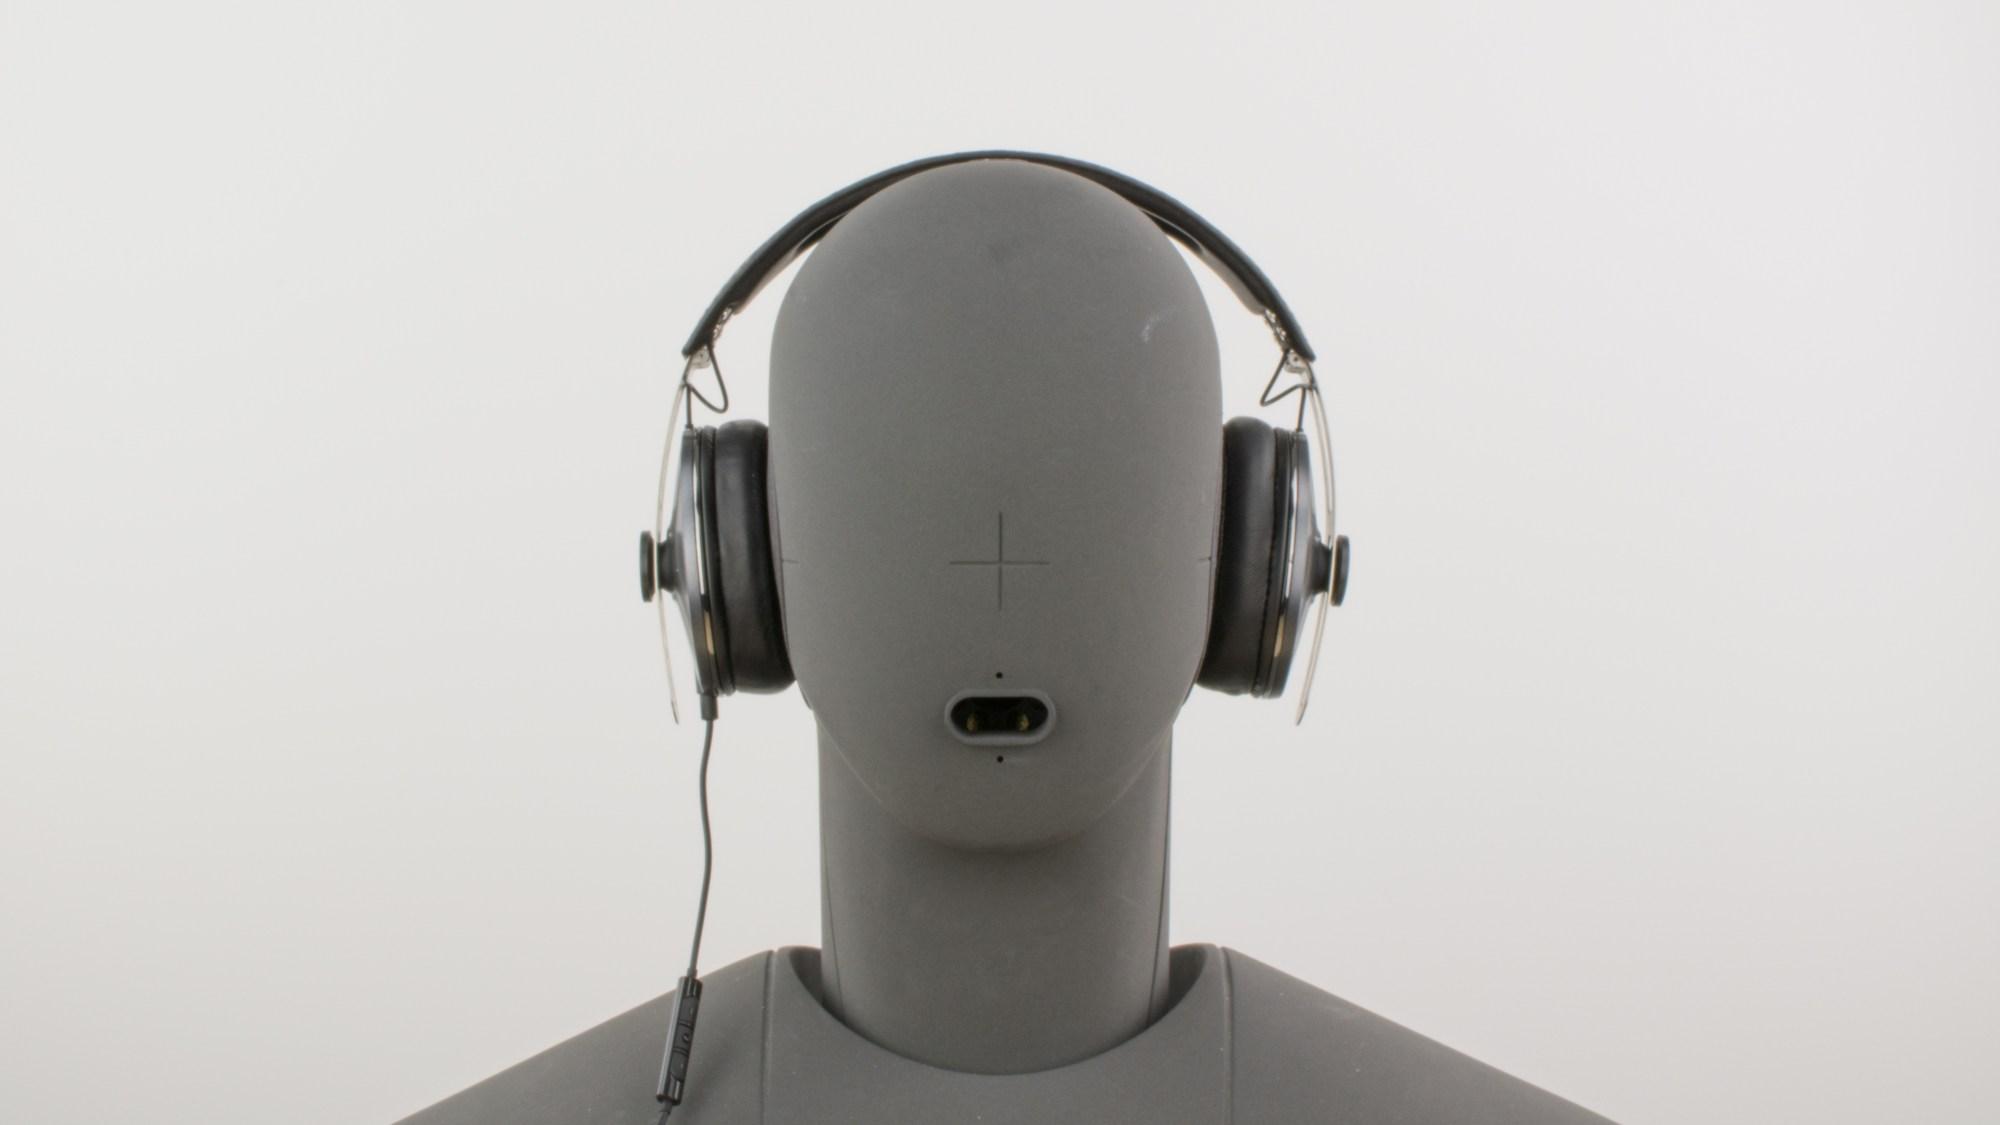 hight resolution of sennheiser headset wiring diagram